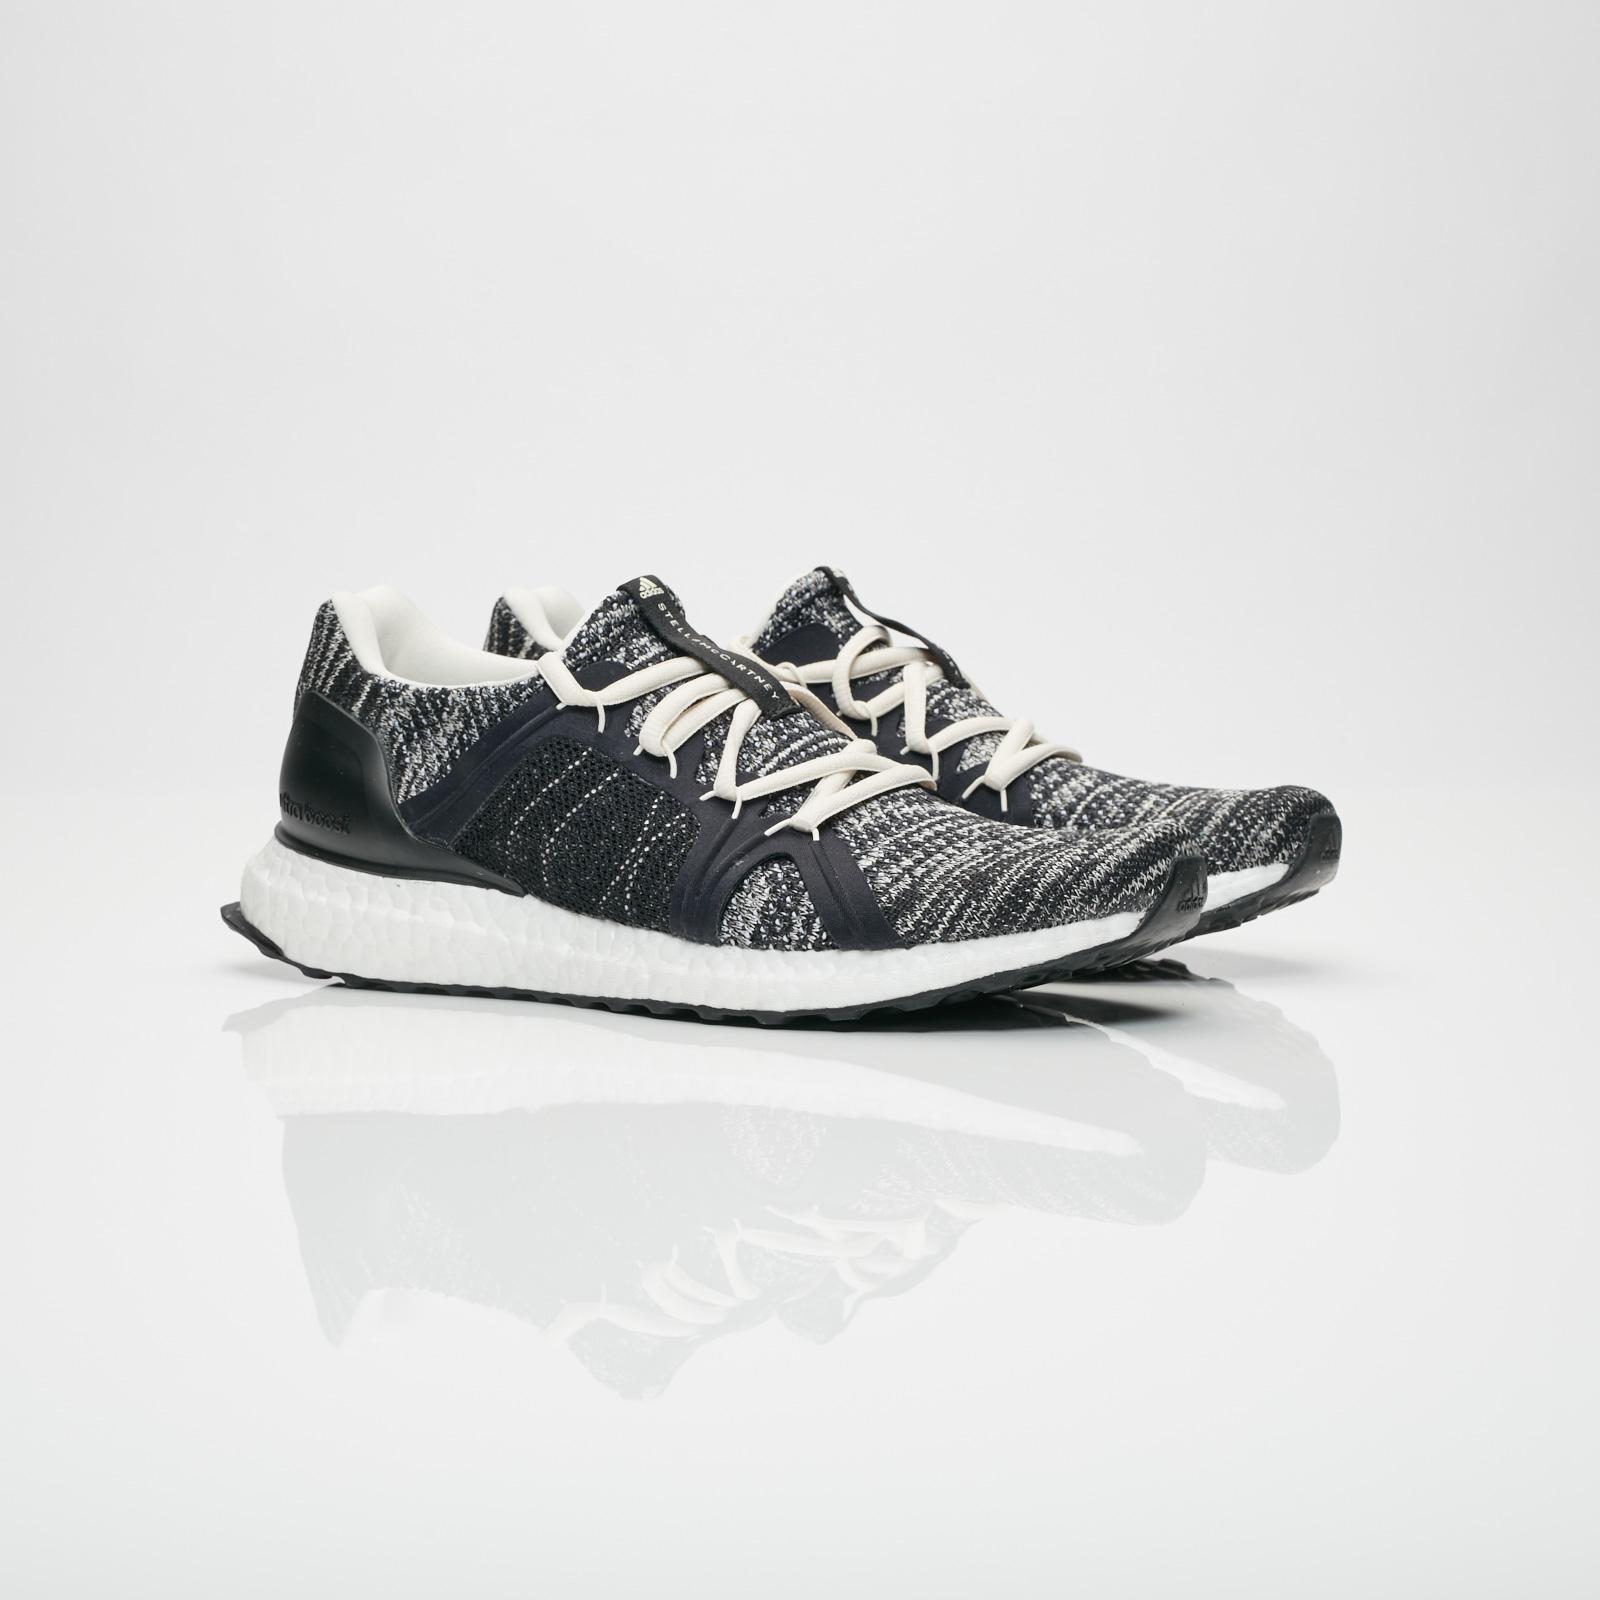 19d24a31efe69 adidas UltraBOOST Parley - Bb6264 - Sneakersnstuff